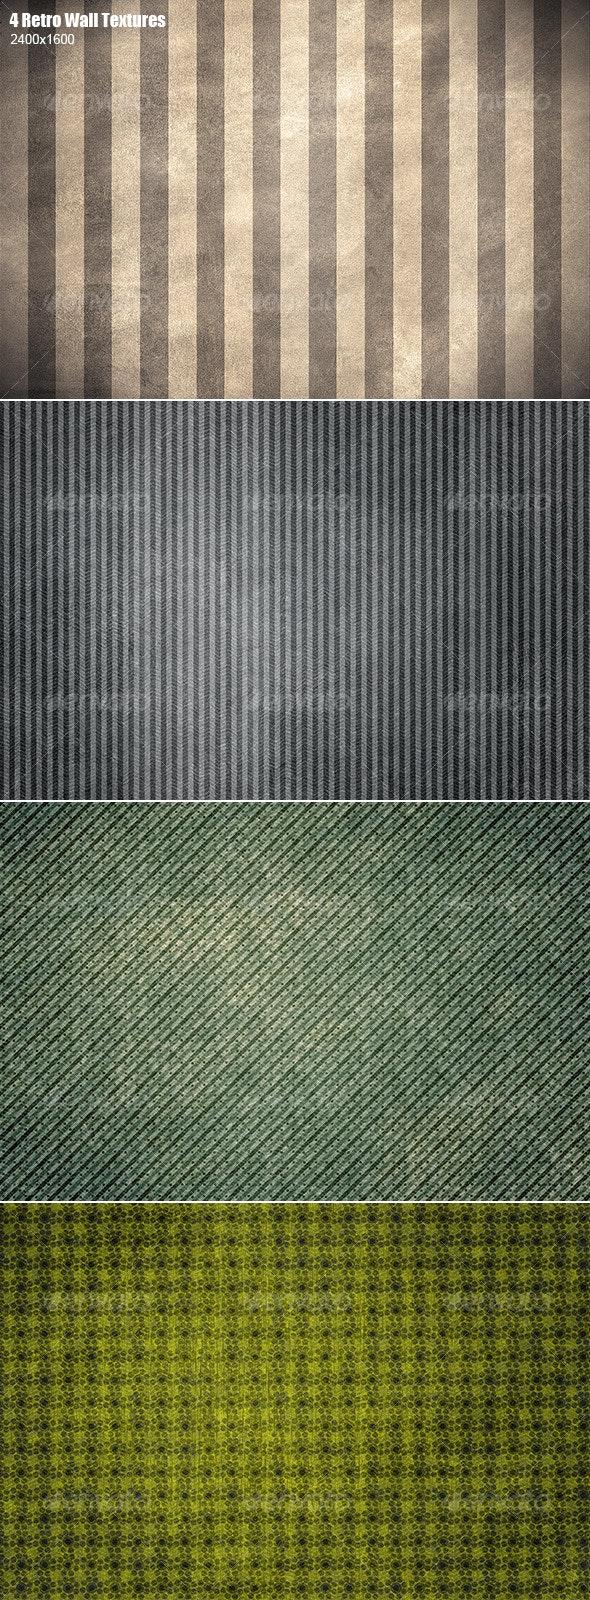 Retro Wall Texture - Industrial / Grunge Textures